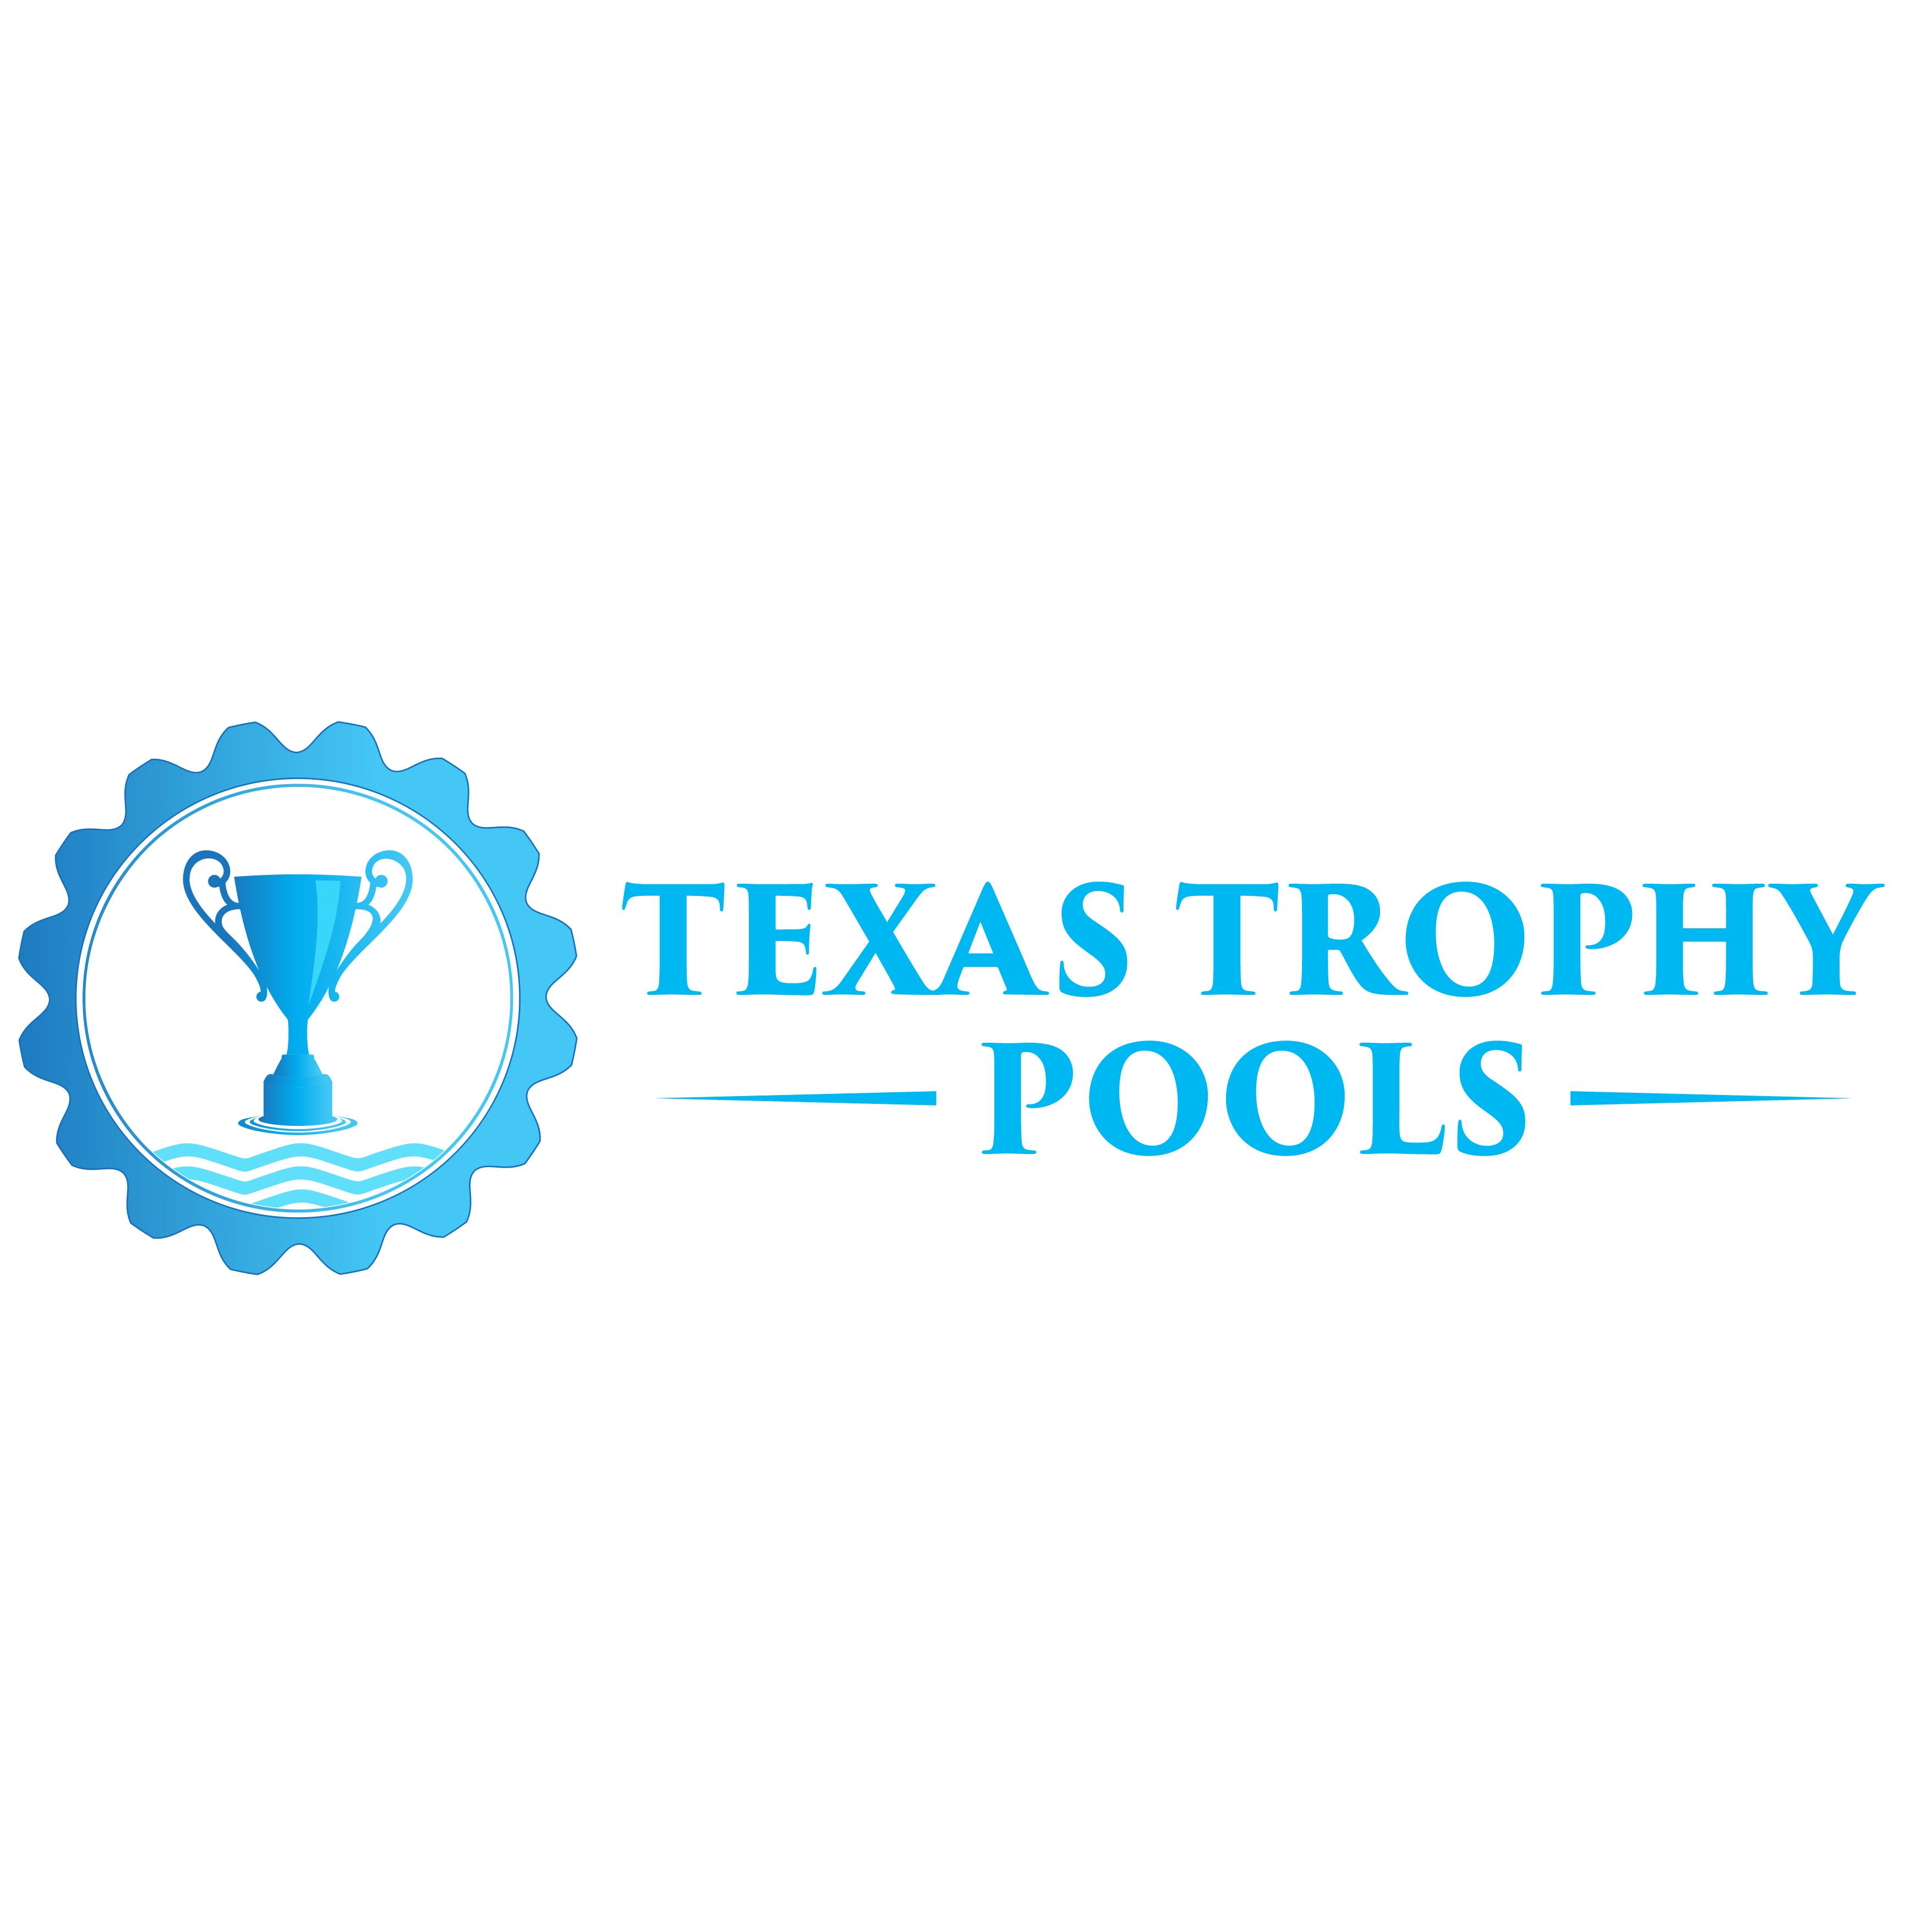 Texas Trophy Pools image 22